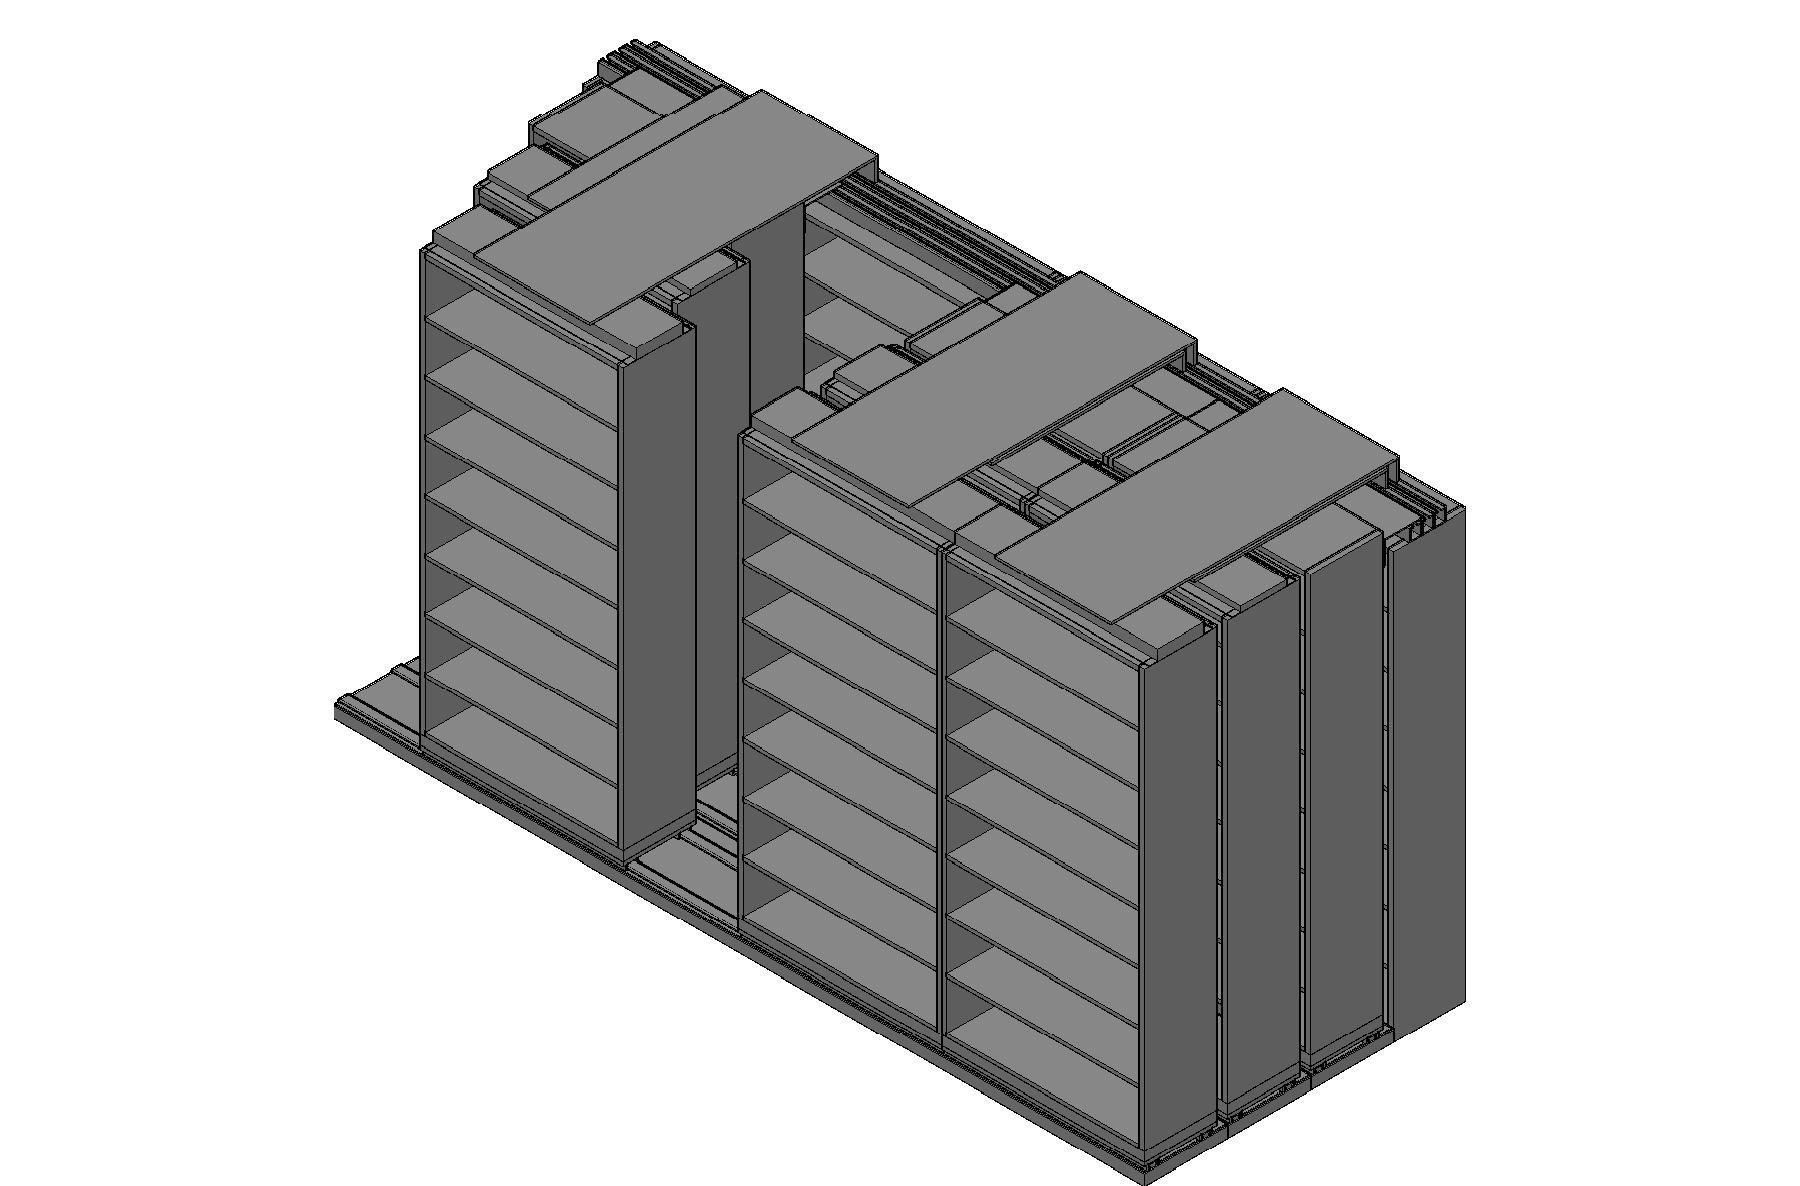 "Legal Size Sliding Shelves - 4 Rows Deep - 8 Levels - (42"" x 15"" Shelves) - 172"" Total Width"